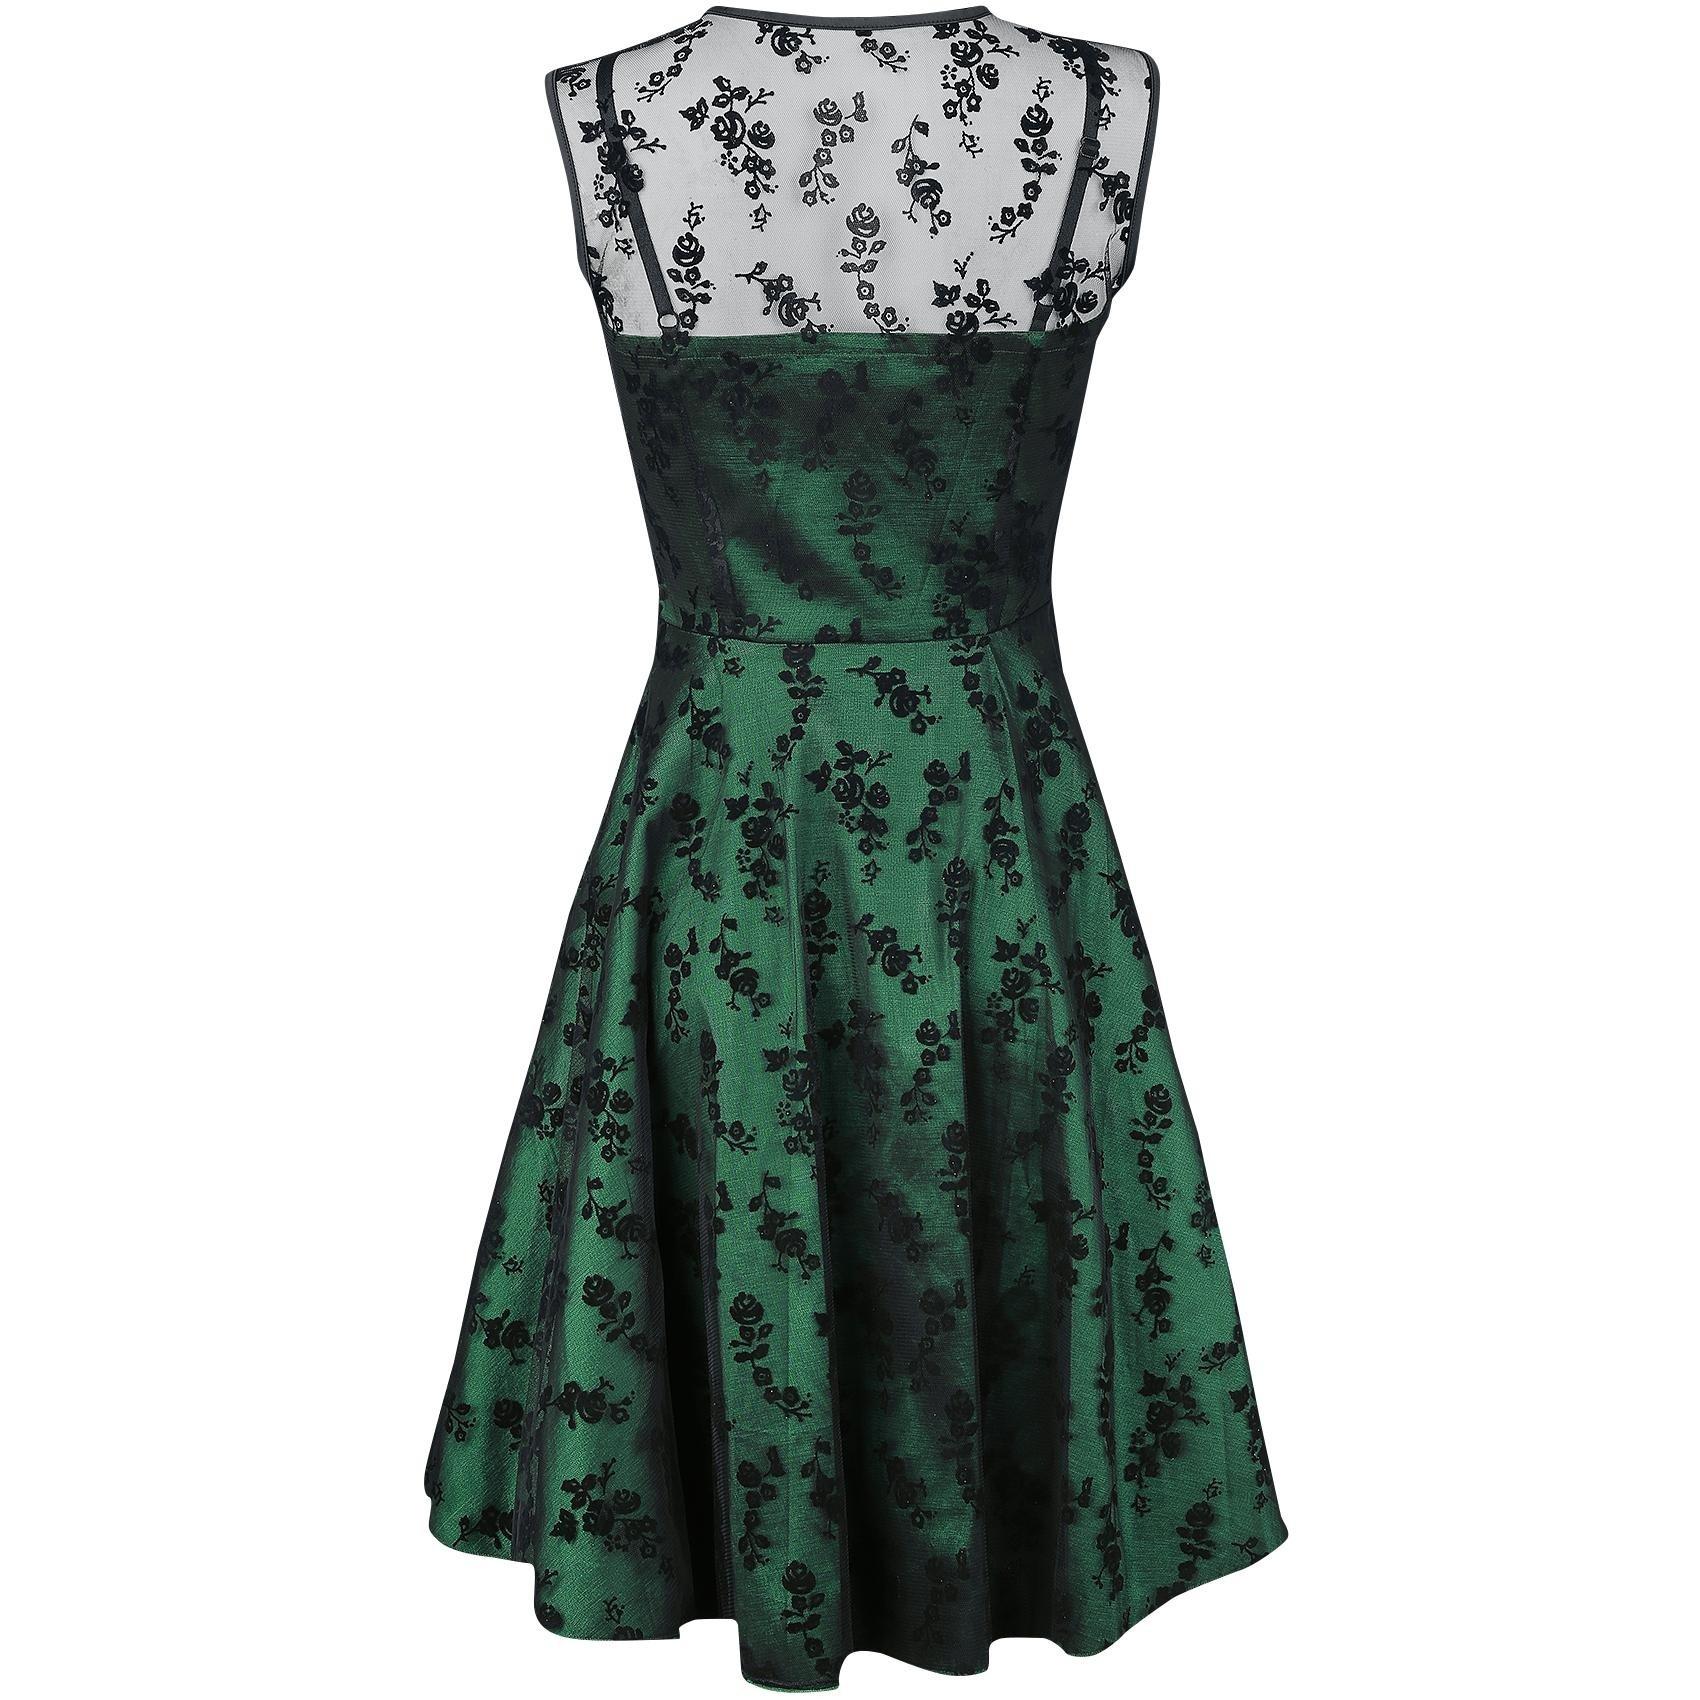 10 Elegant Grünes Kleid Spitze Galerie20 Luxus Grünes Kleid Spitze Galerie